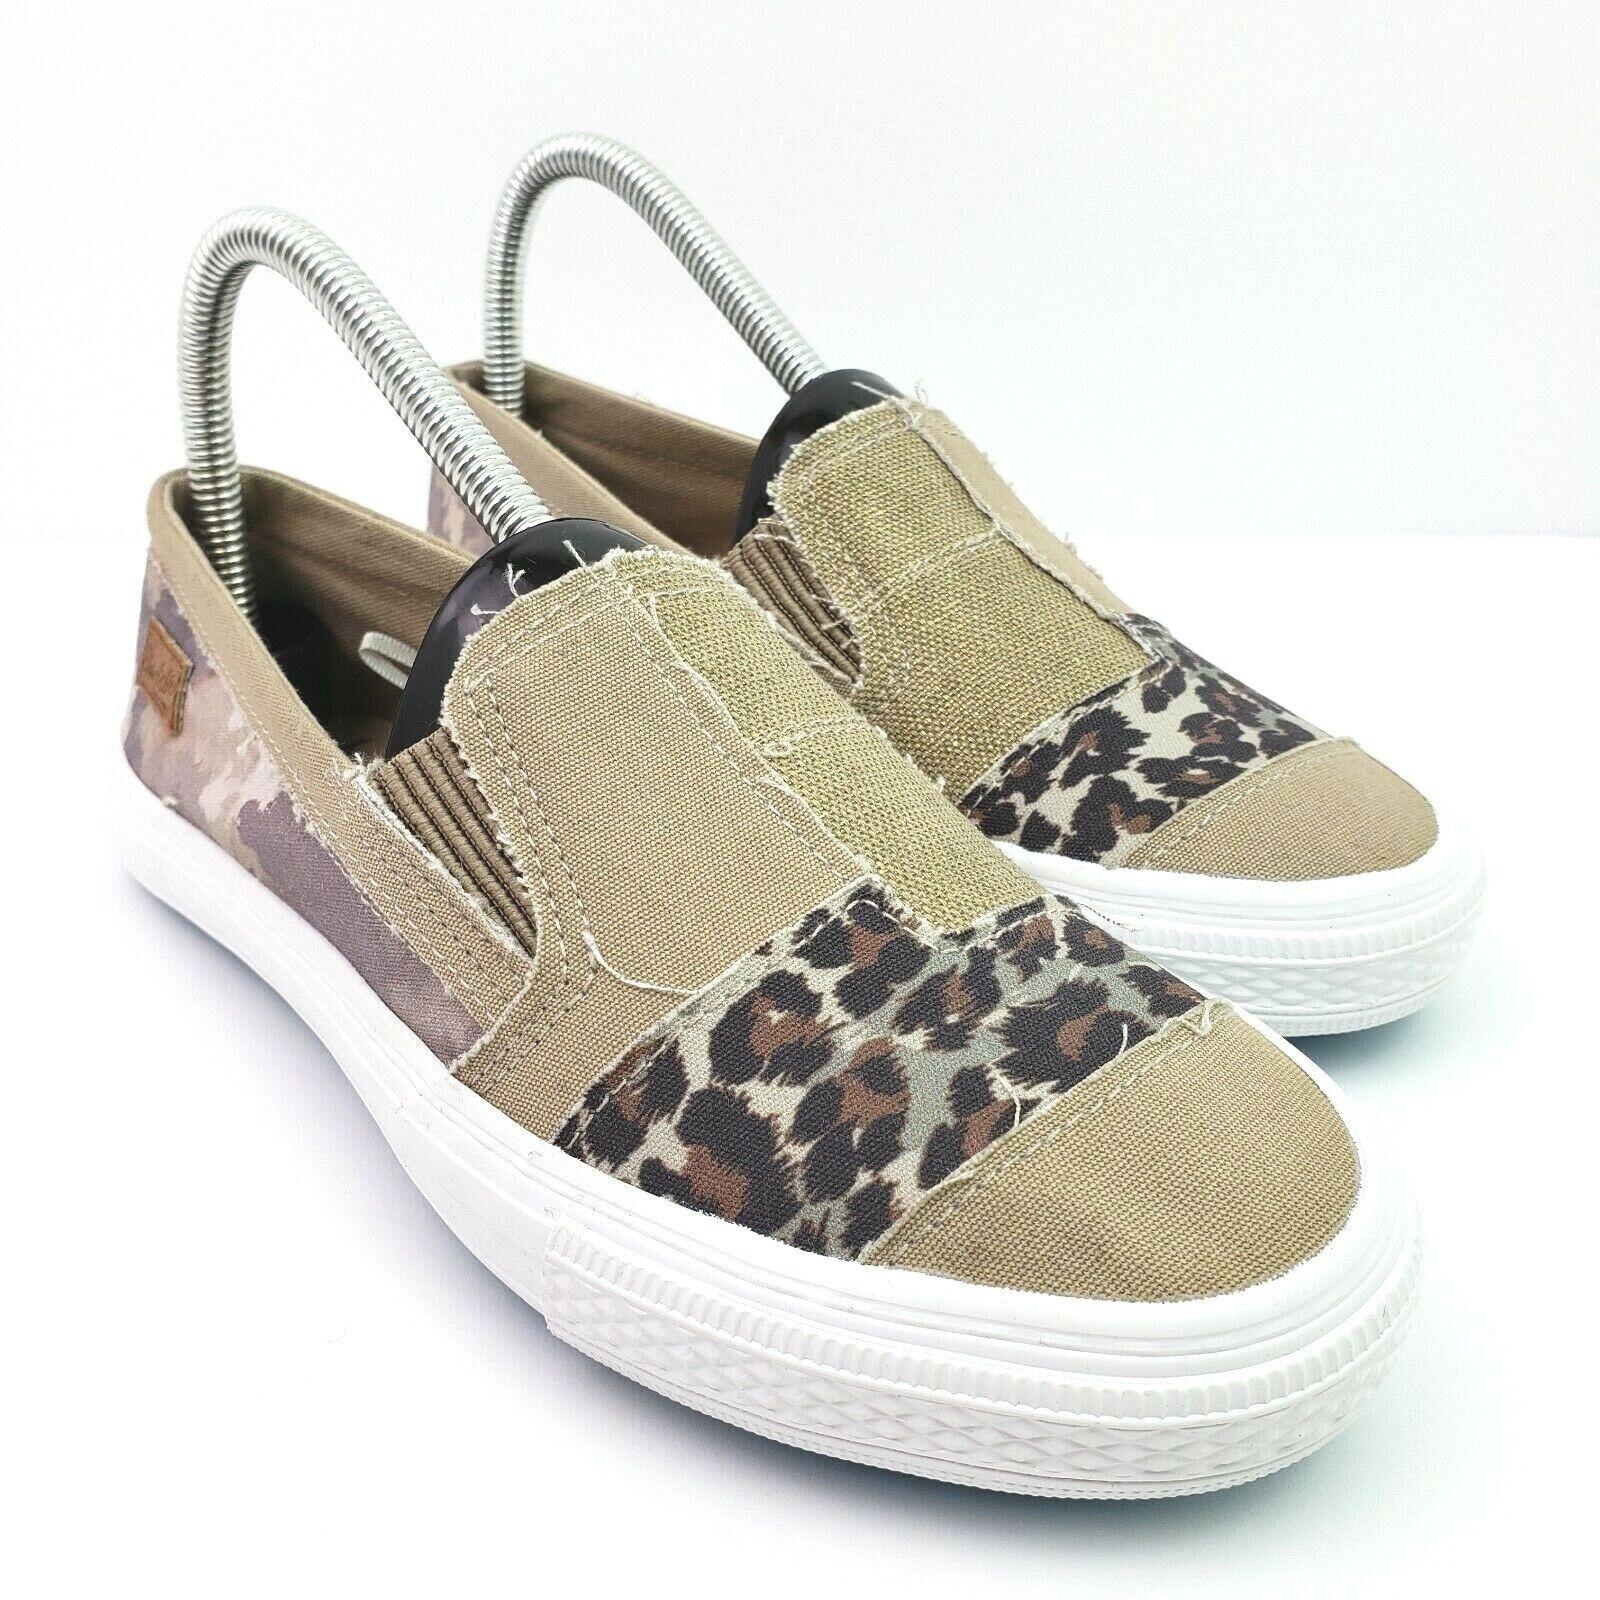 Blowfish Malibu Aliso Womens Size 7.5 Tan Leopard Slip On Comfort Flats Shoes